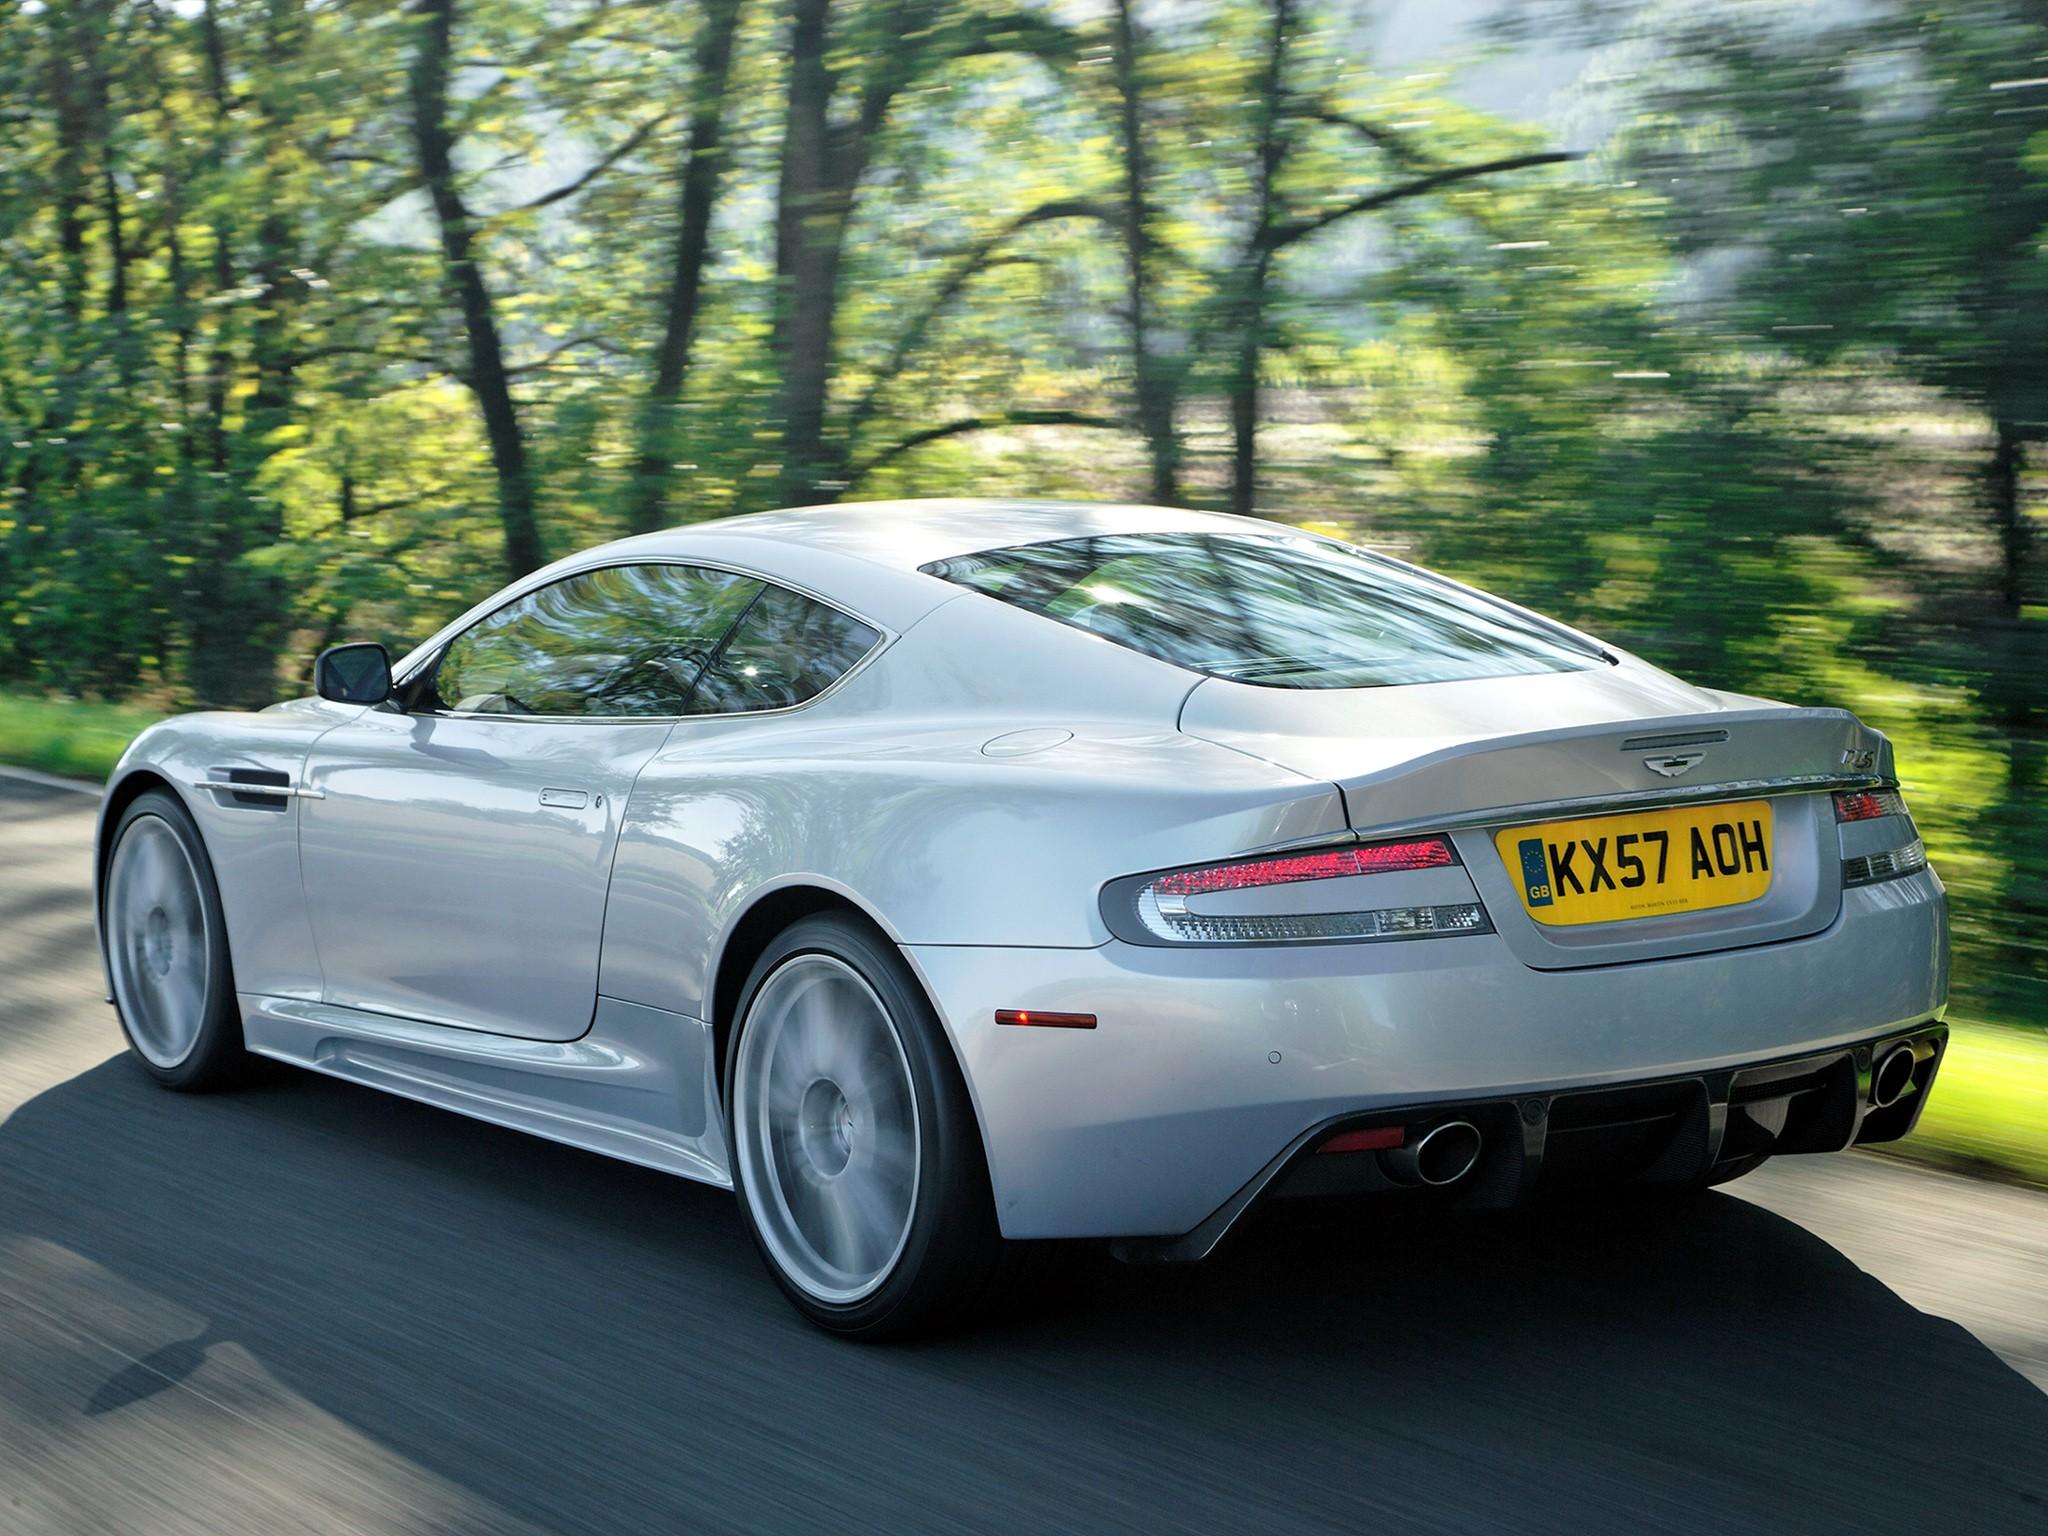 Aston Martin Dbs Specs 2008 2009 2010 2011 2012